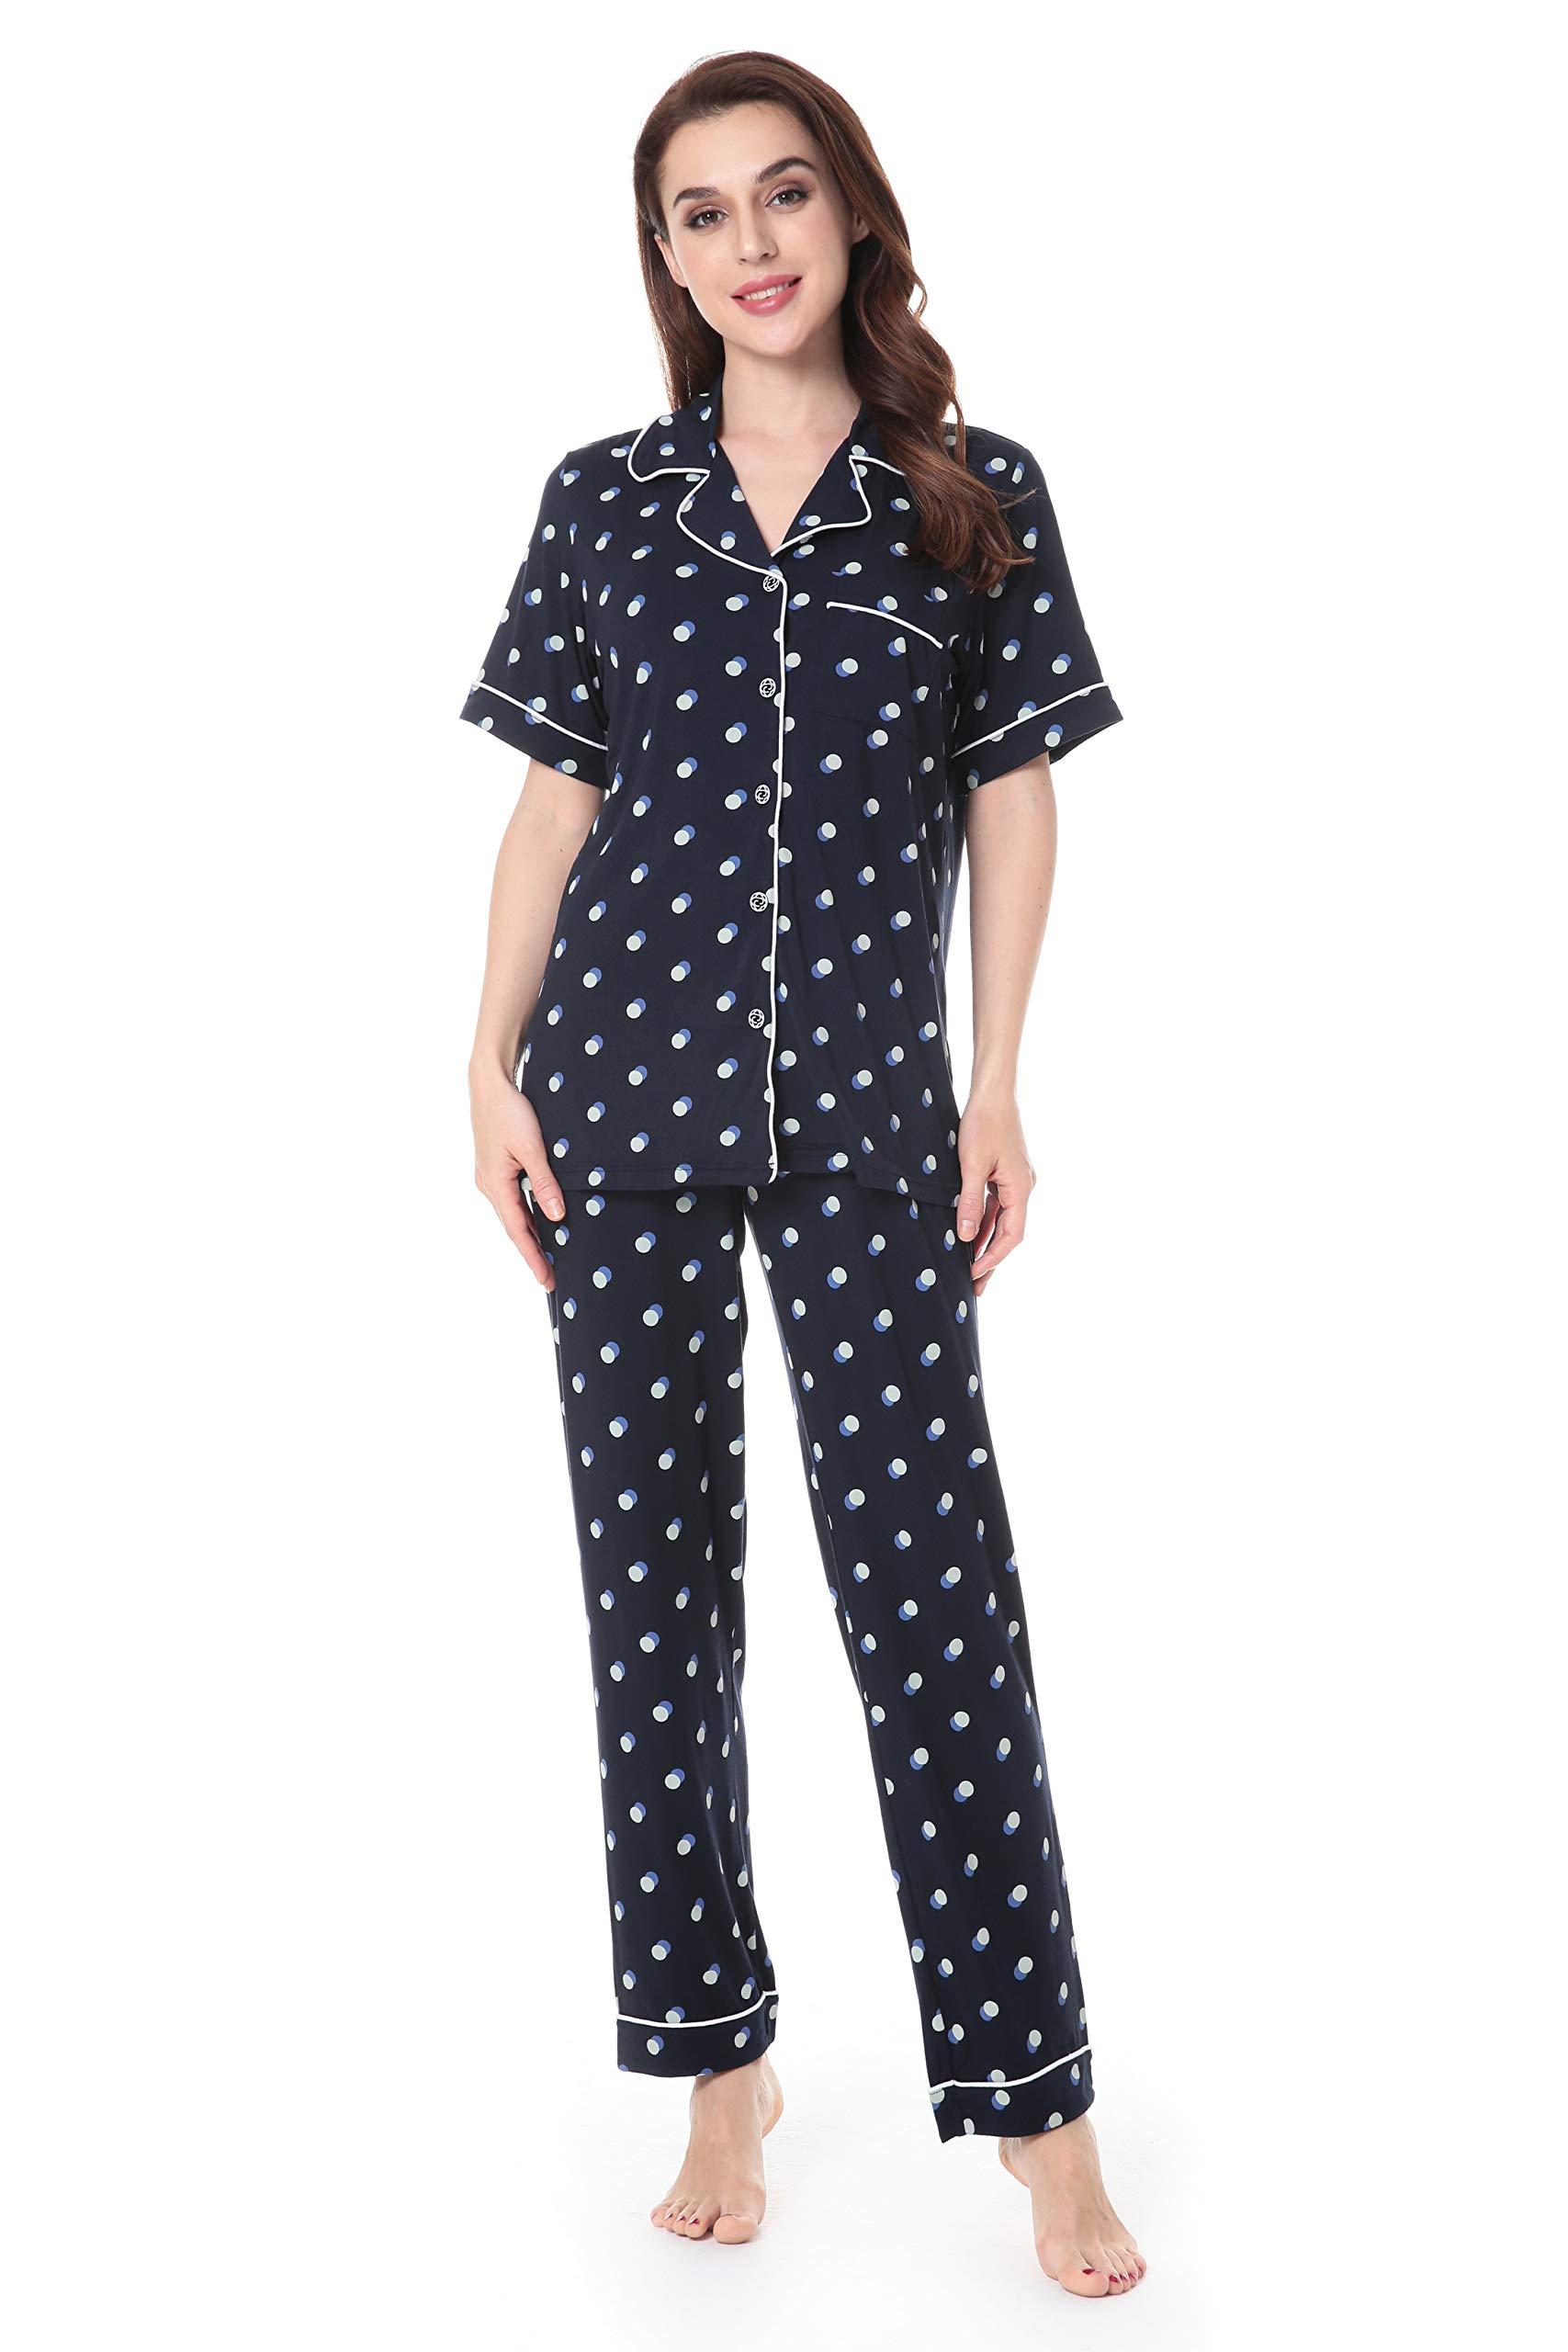 N NORA TWIPS Women's Bamboo Pajamas Set Short Sleeve Sleepwear Soft PjS